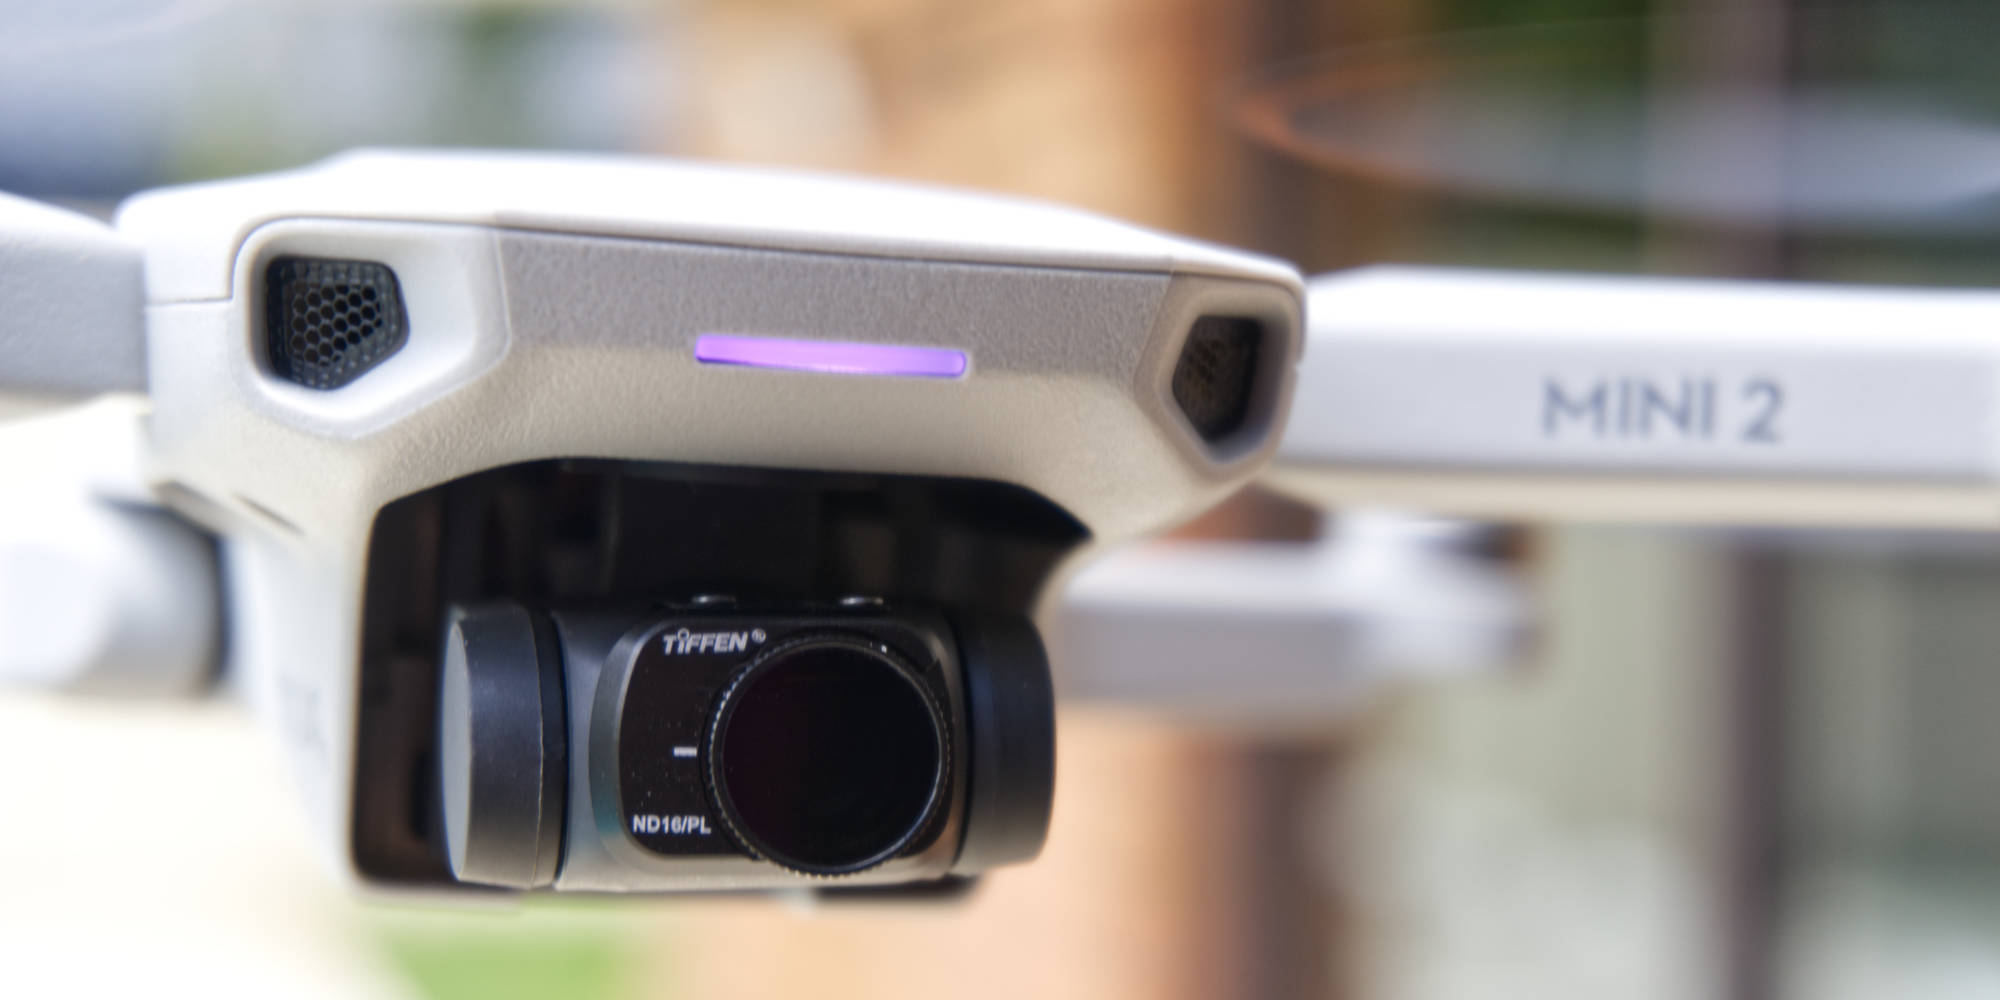 Tiffen DJI Mavic Mini 2 Japan regulations 100-gram drones